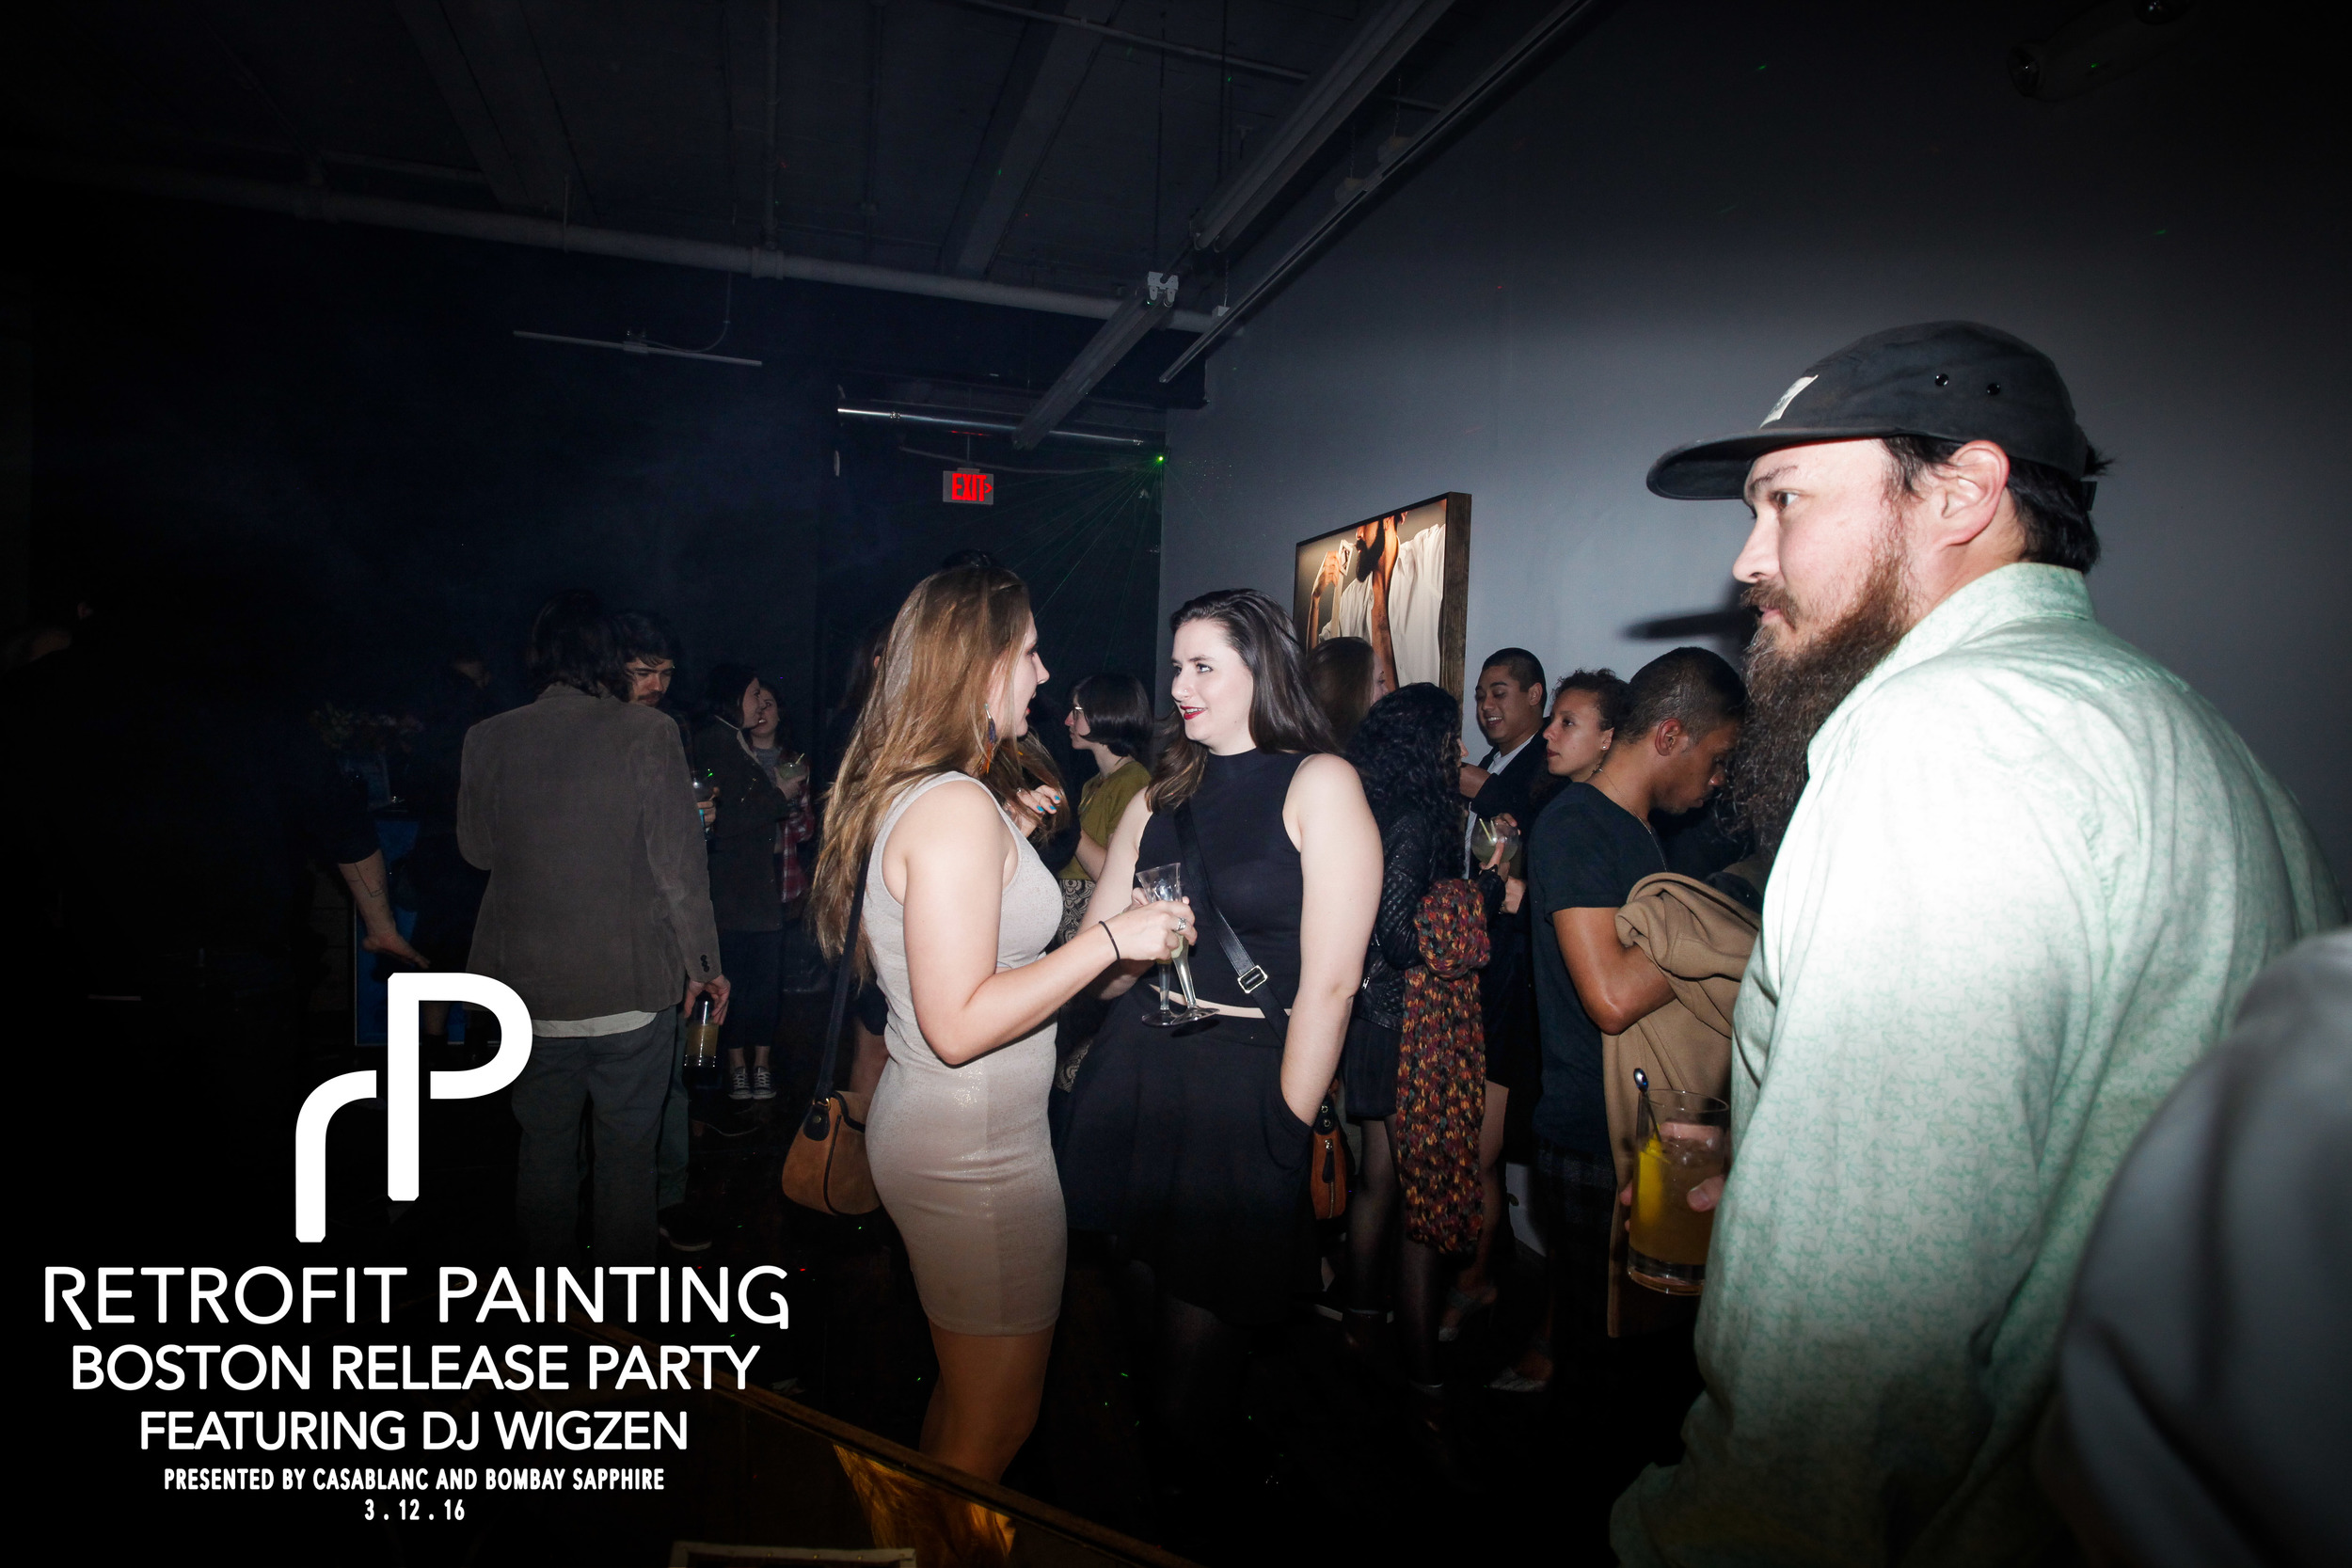 Retrofit Painting Boston Release Party 0036.jpg